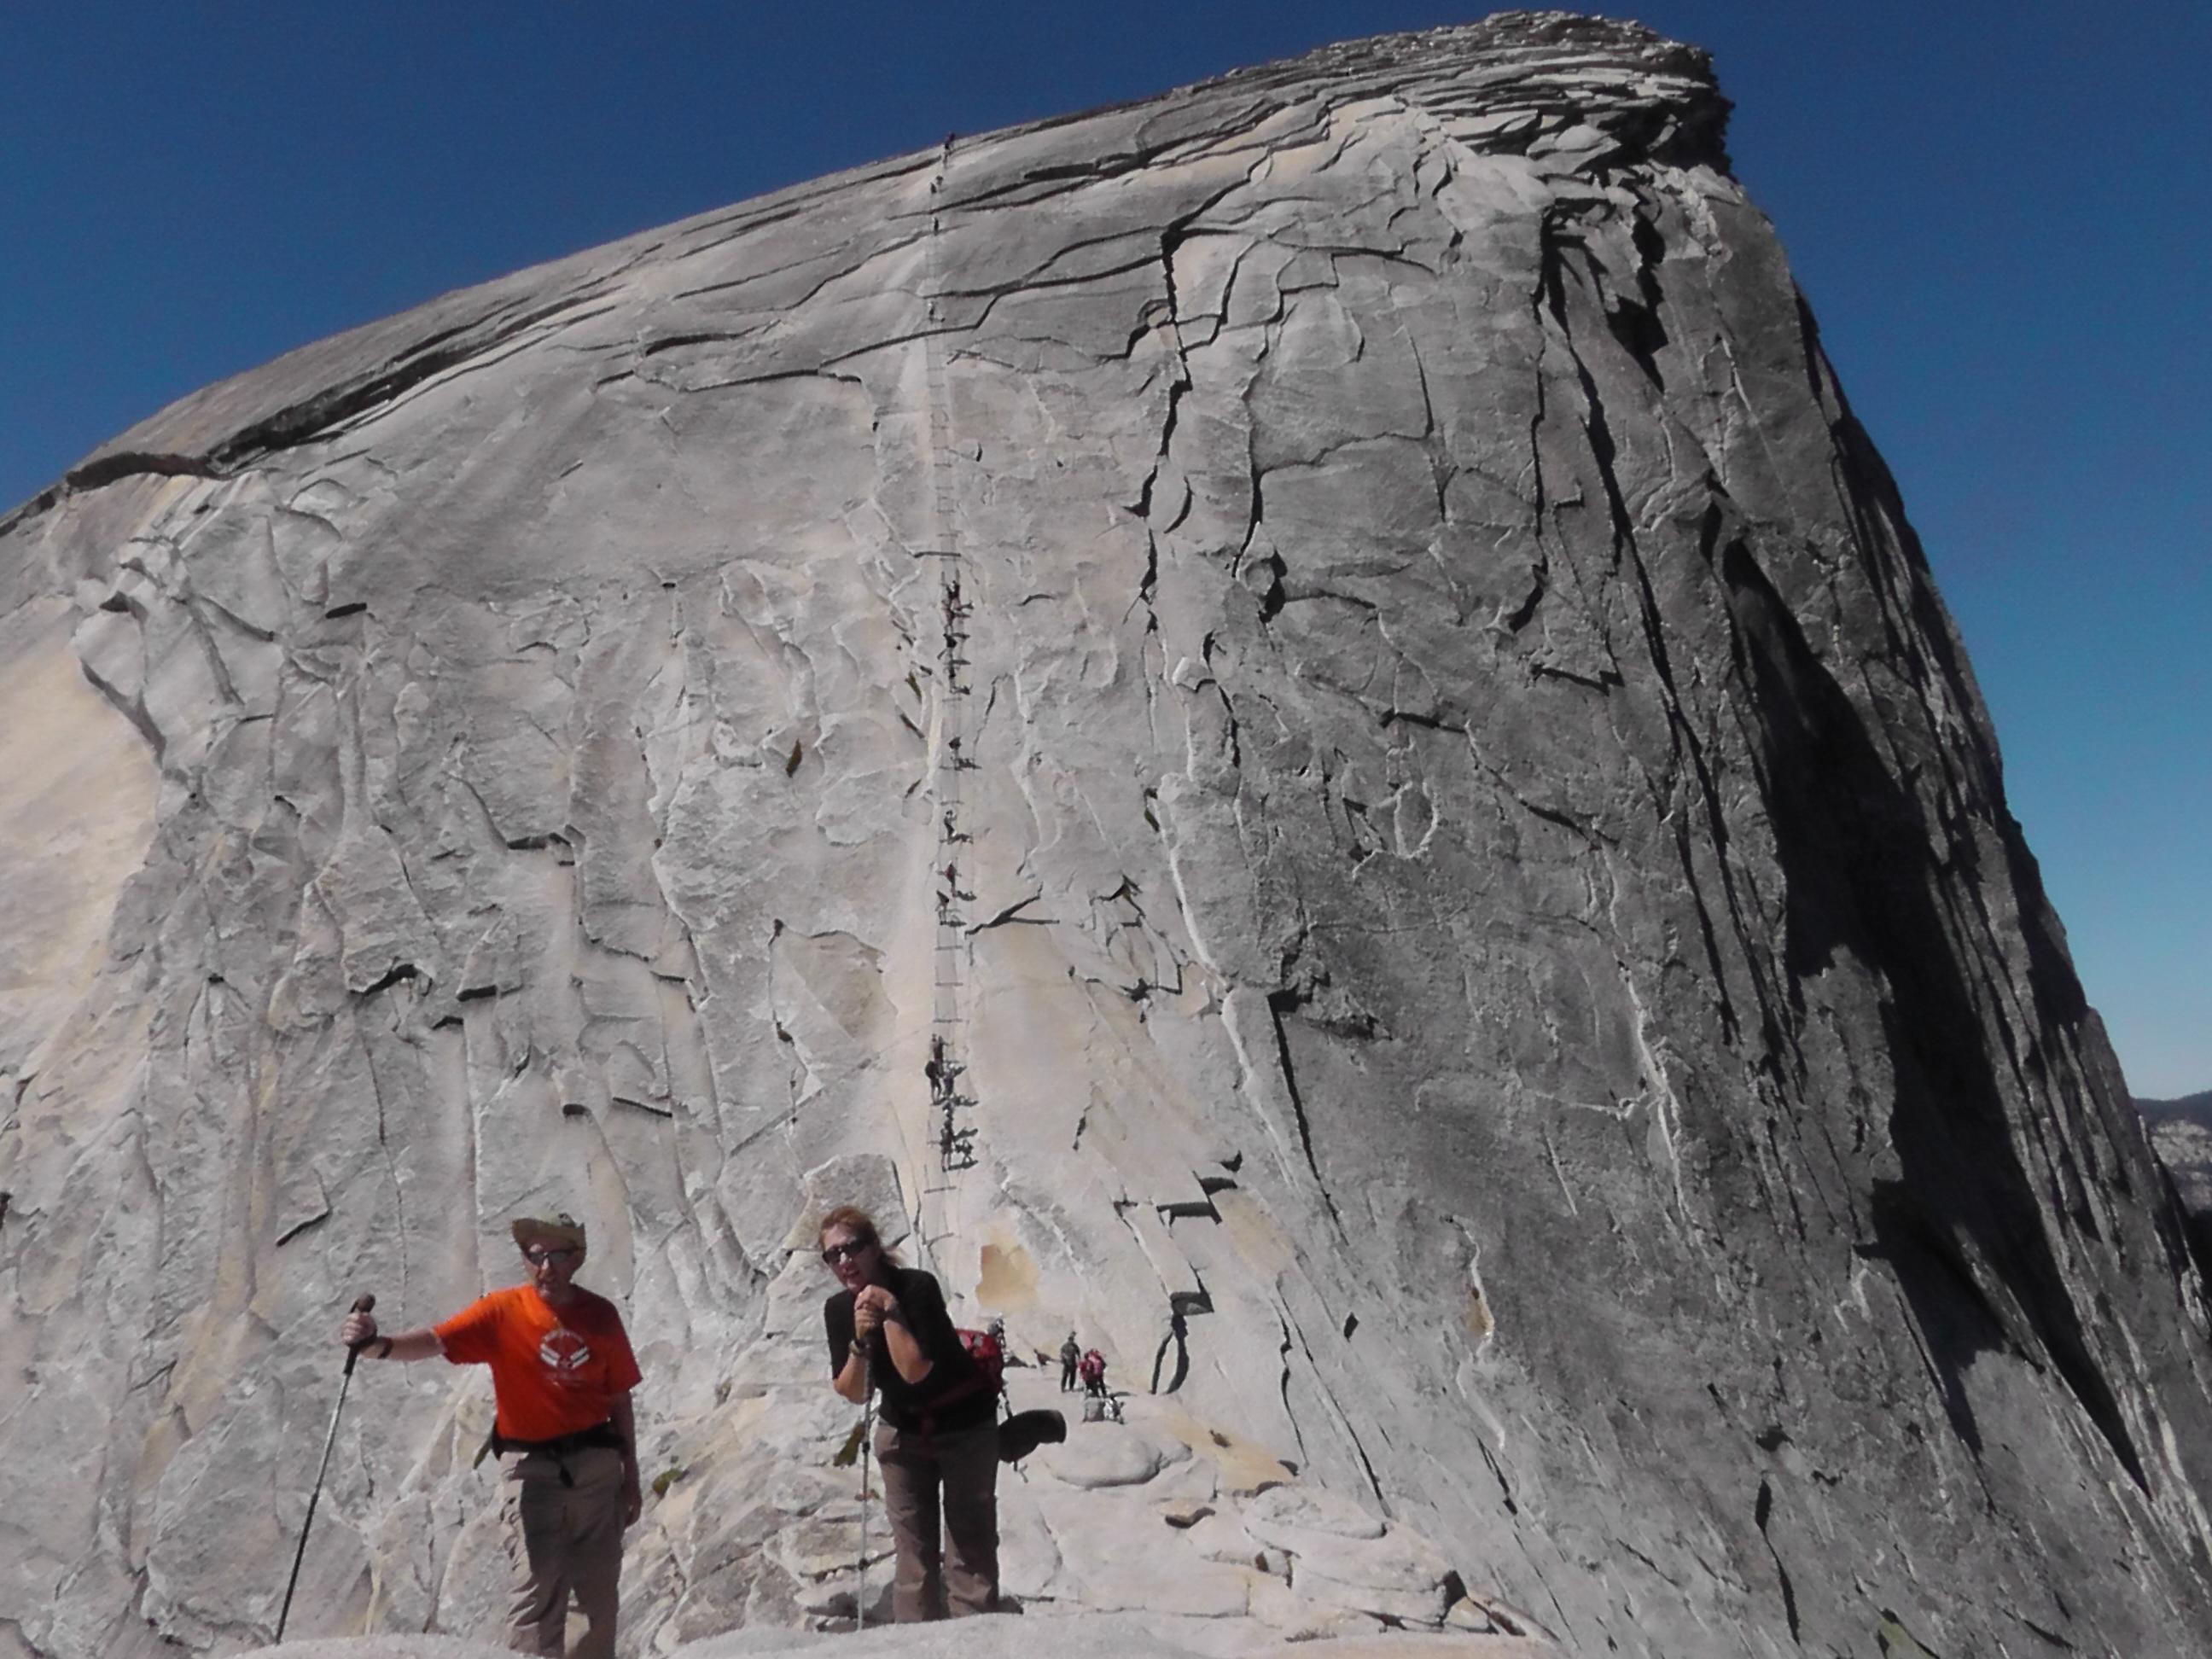 Yosemite National Park Fitpacking Trip 2019